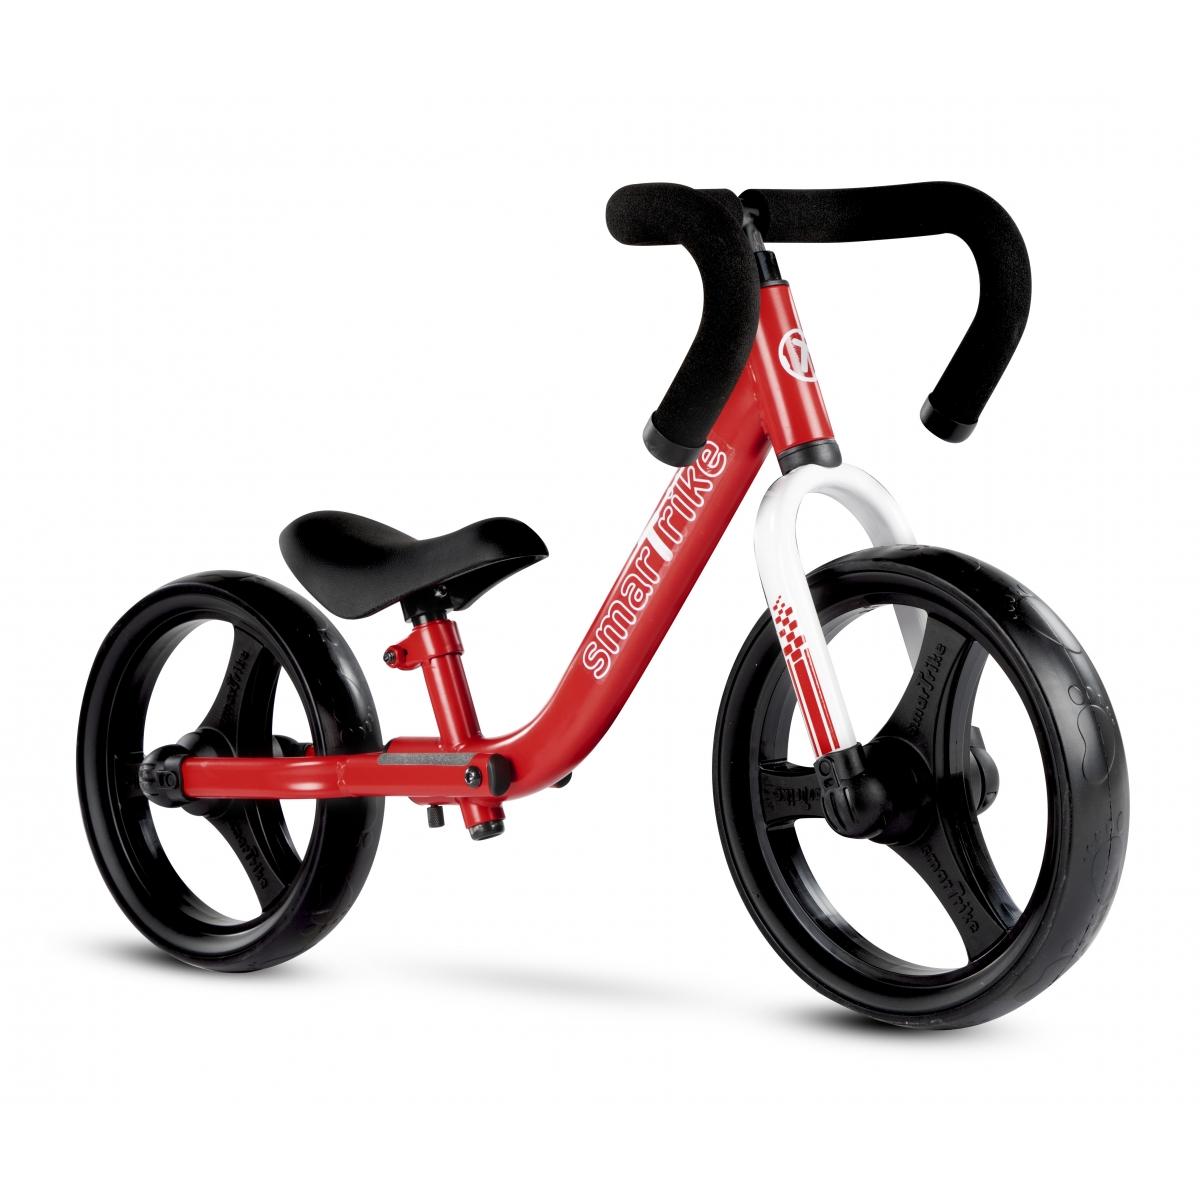 SmarTrike Folding Balance Bike Red (NEW)